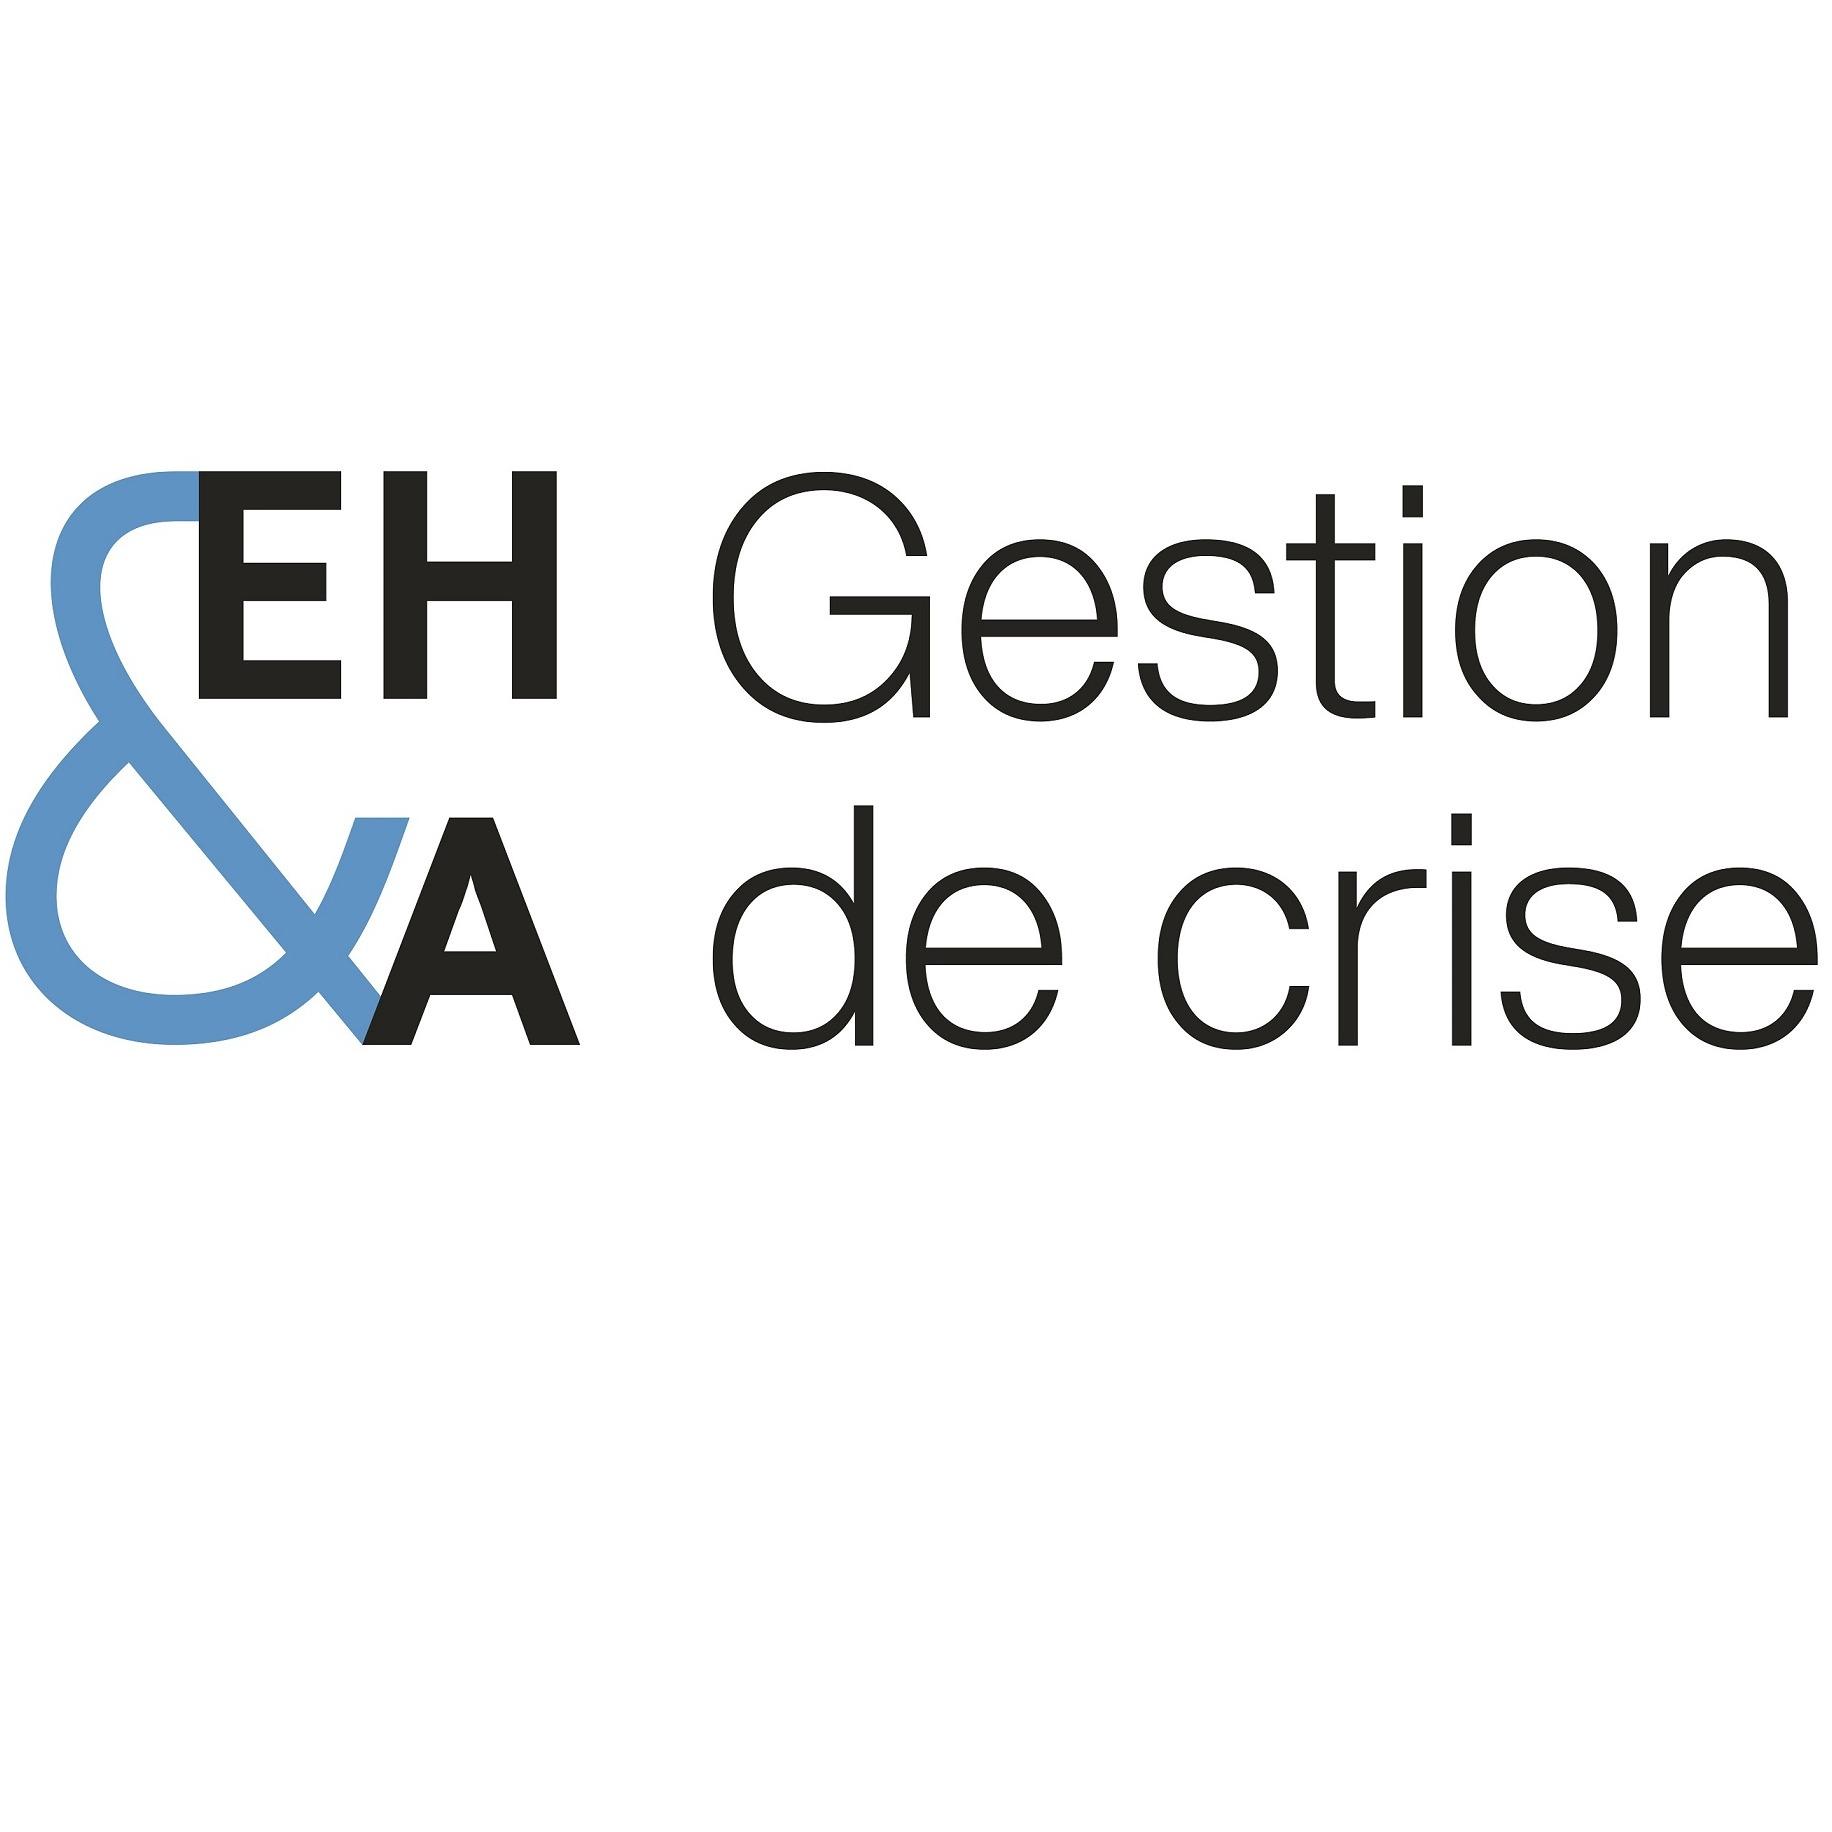 the EH&A logo.